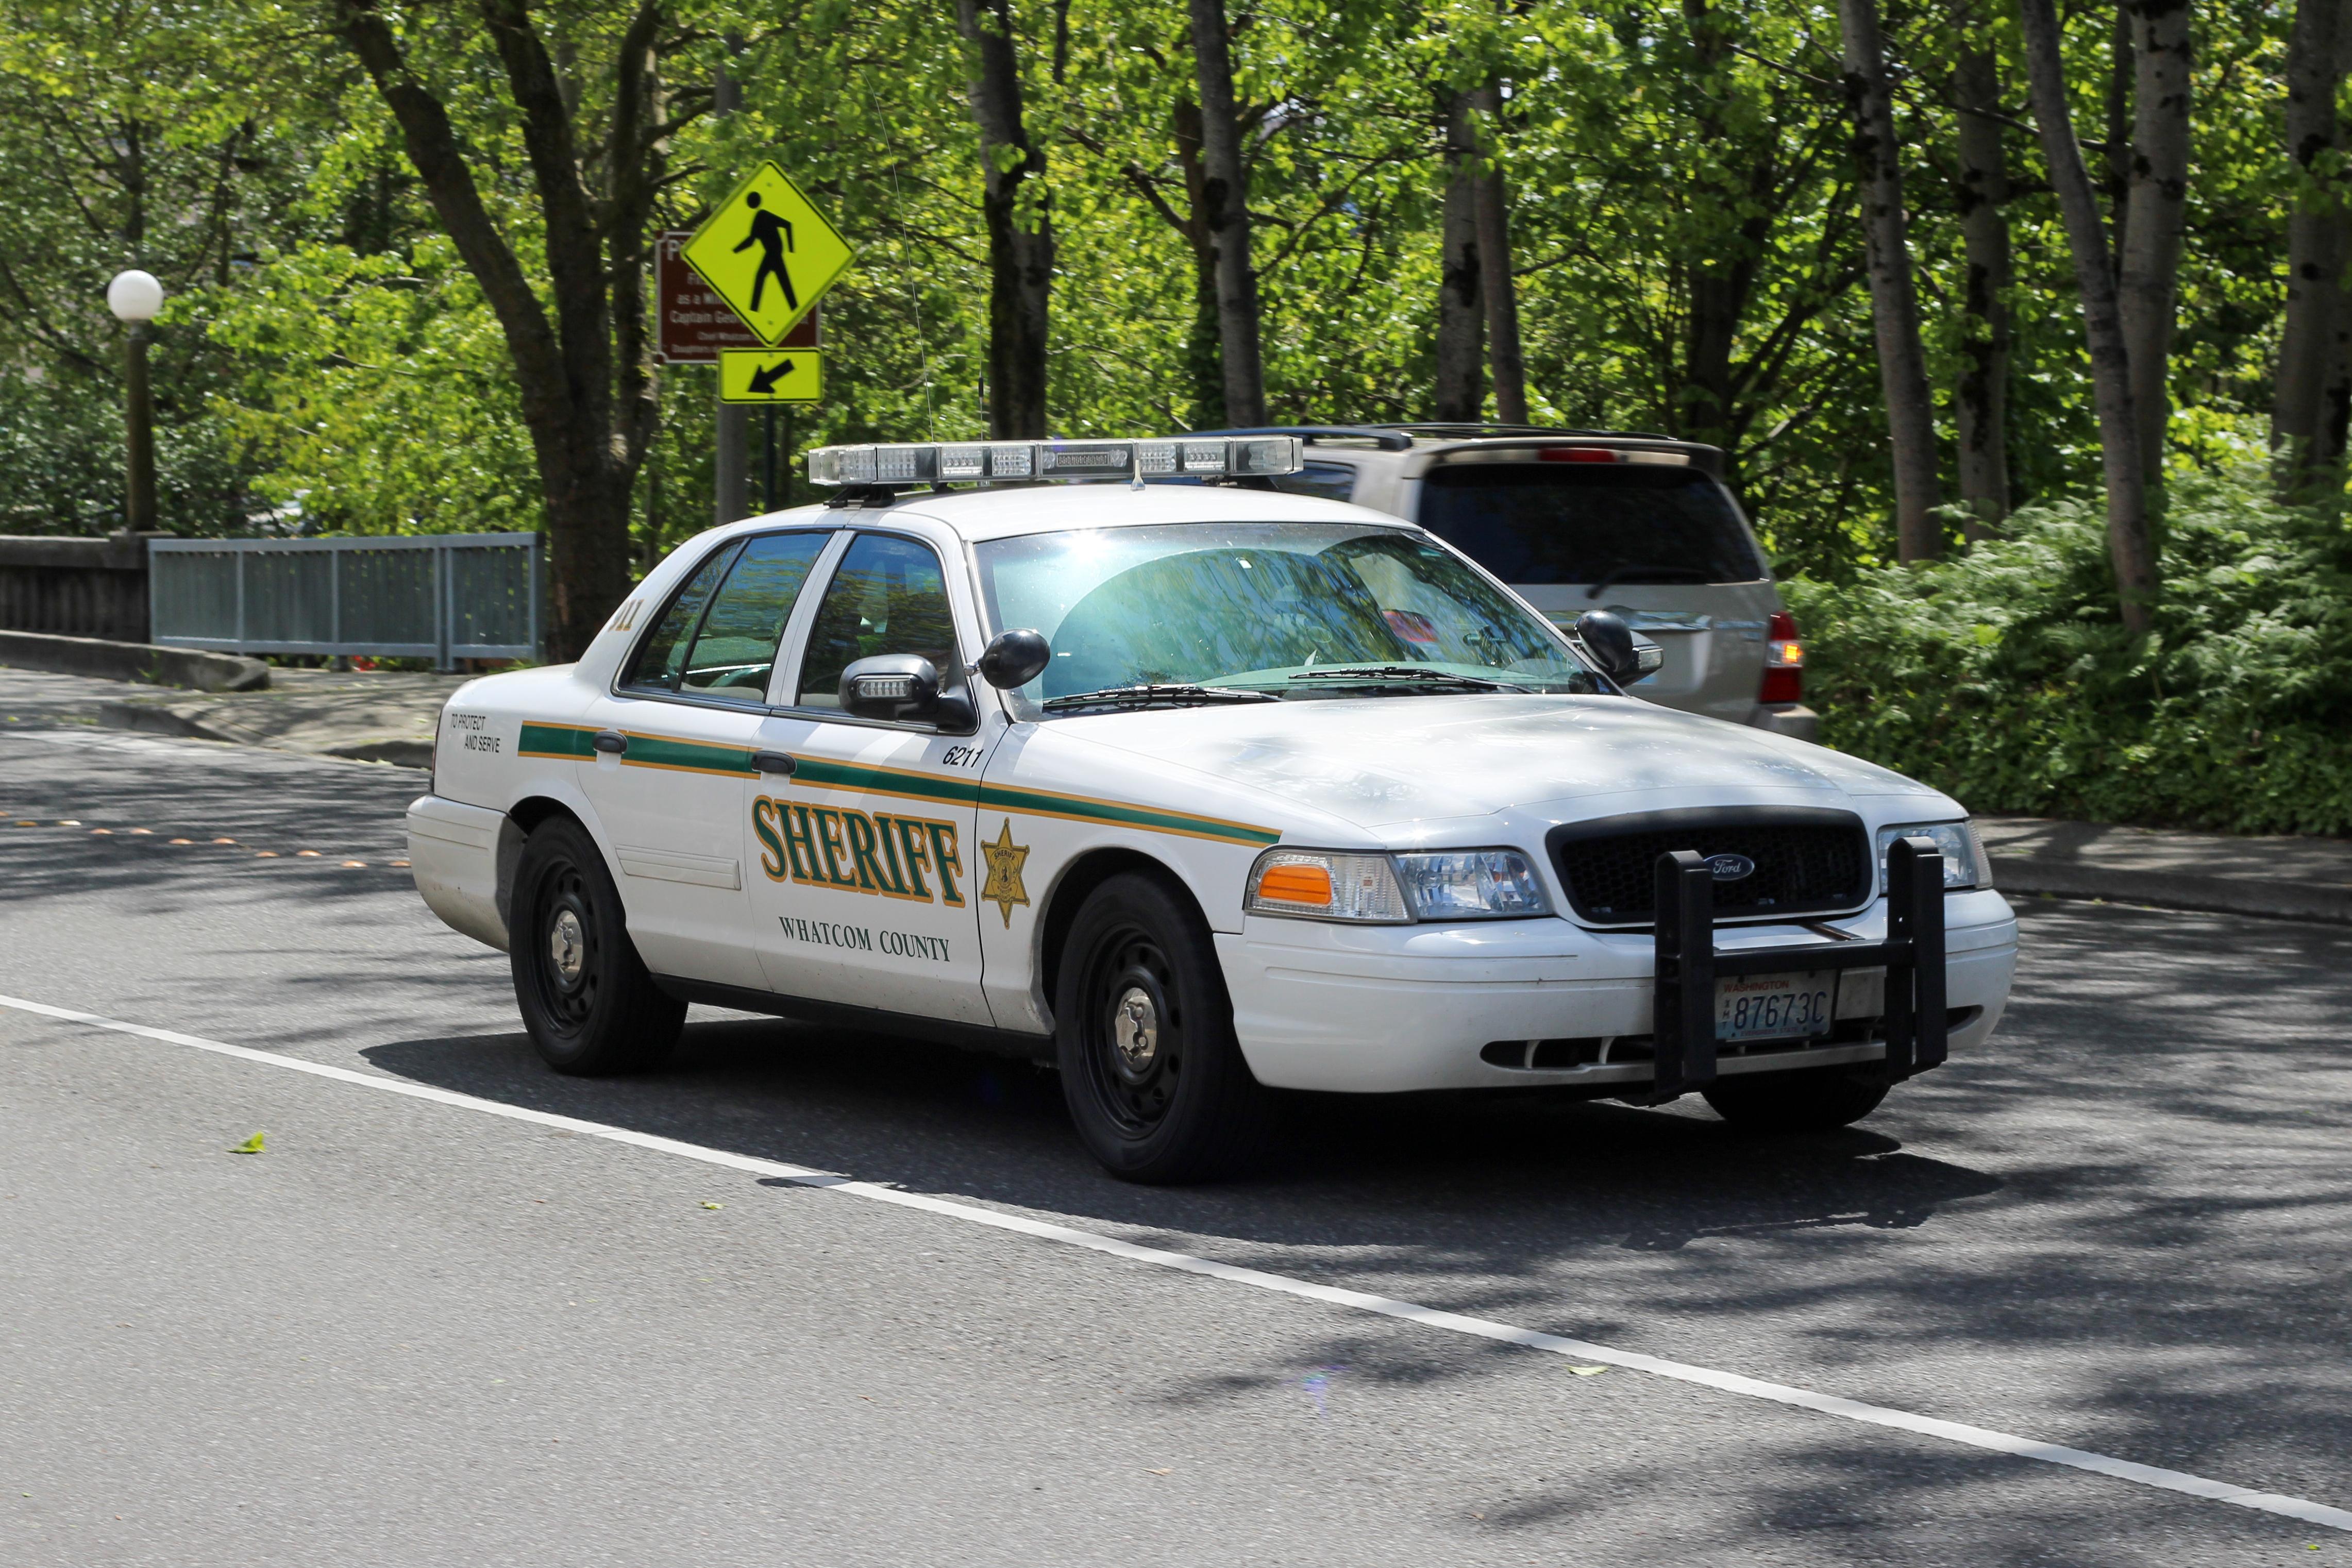 Whatcom County Sheriff (6211), Bellingham WA, Car, Outdoor, Police, HQ Photo